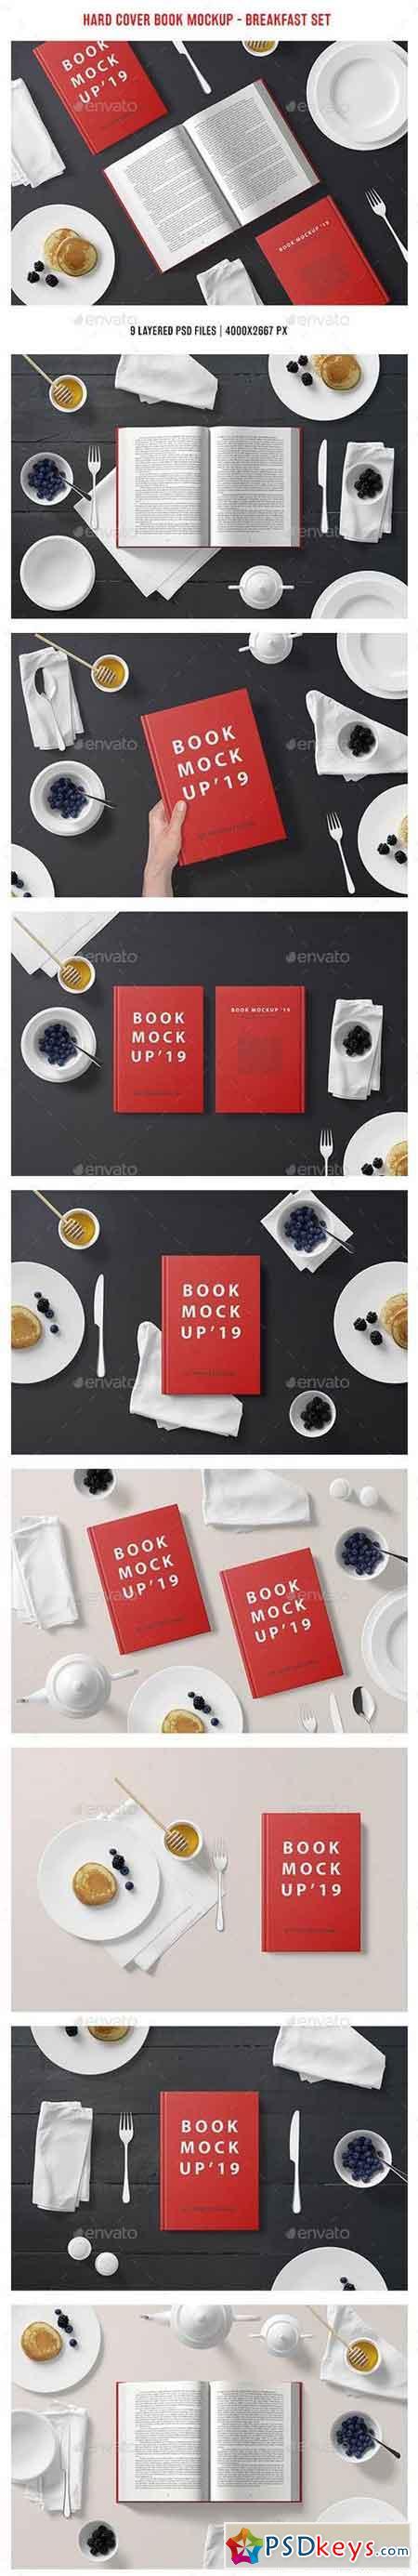 Hard Cover Book Mockup - Breakfast Set 23047642